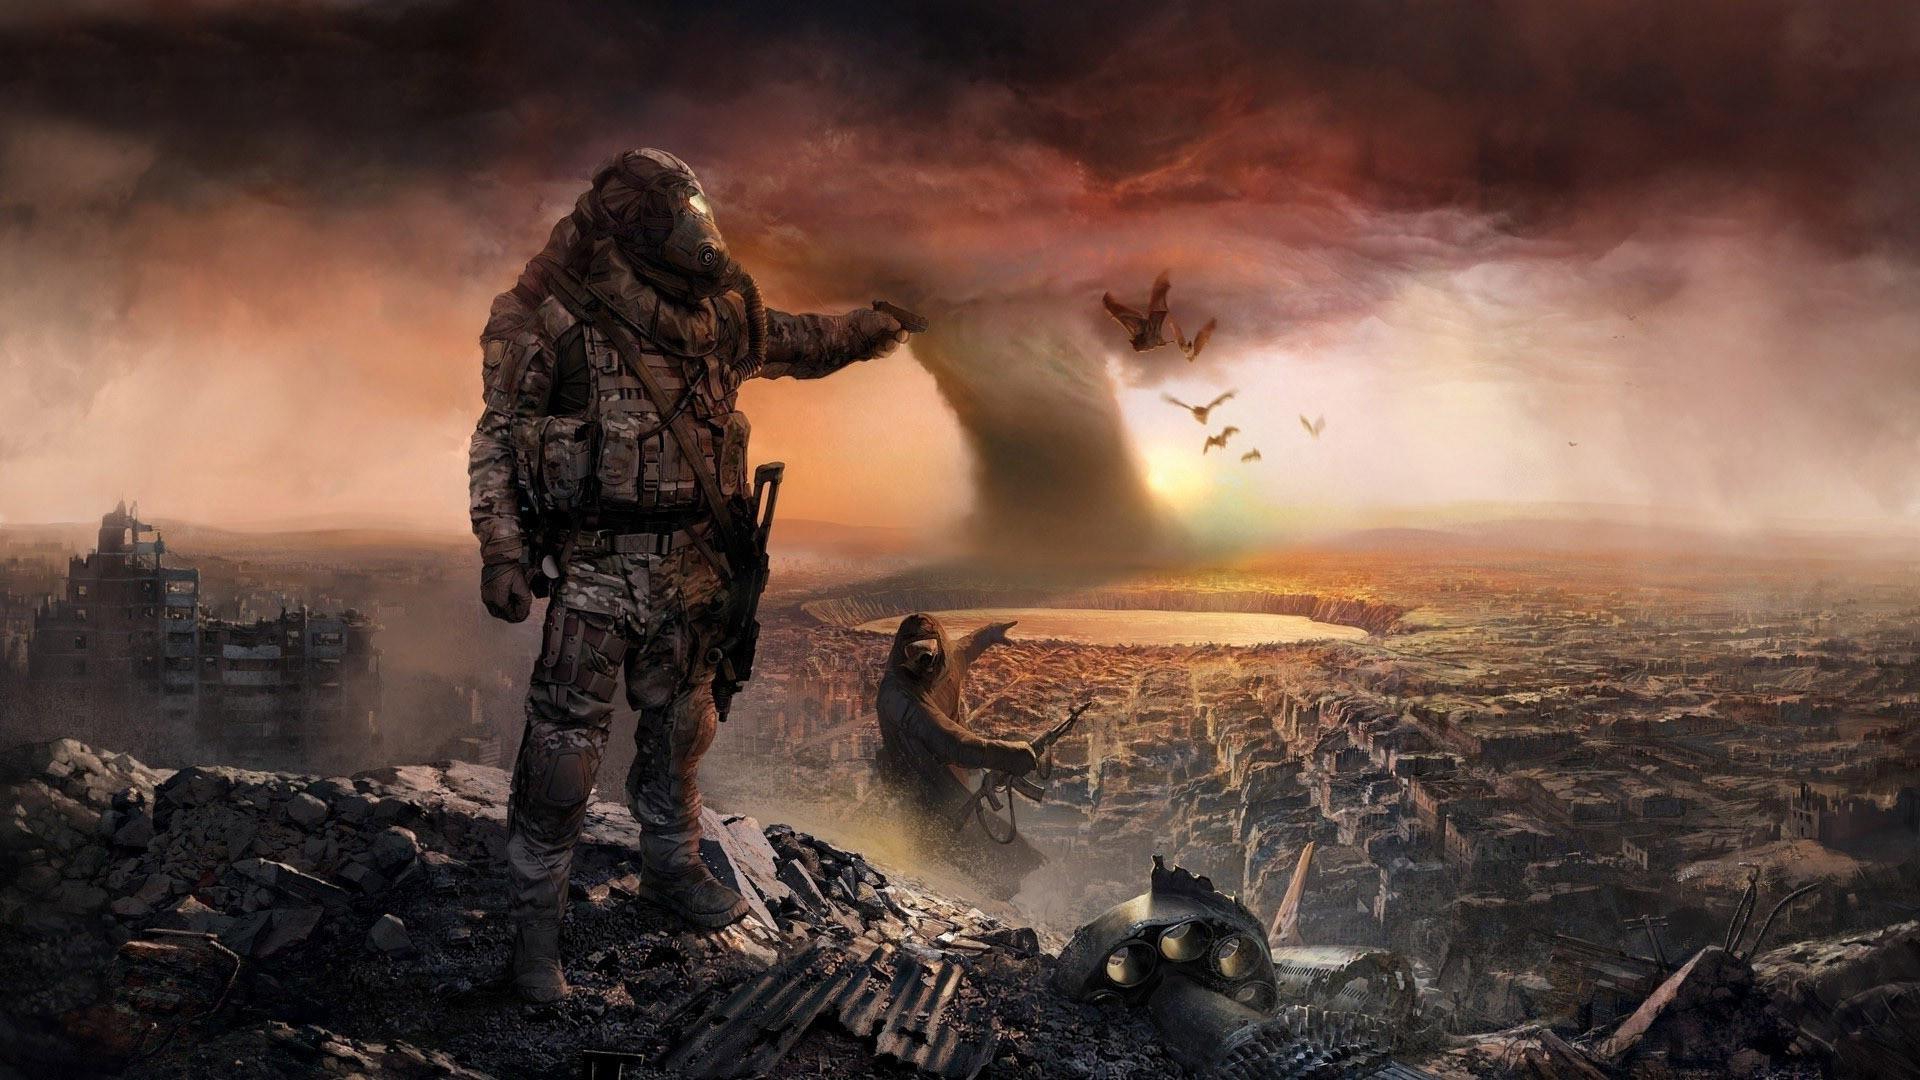 Post-apocalyptic city HD Wallpaper 1920×1080